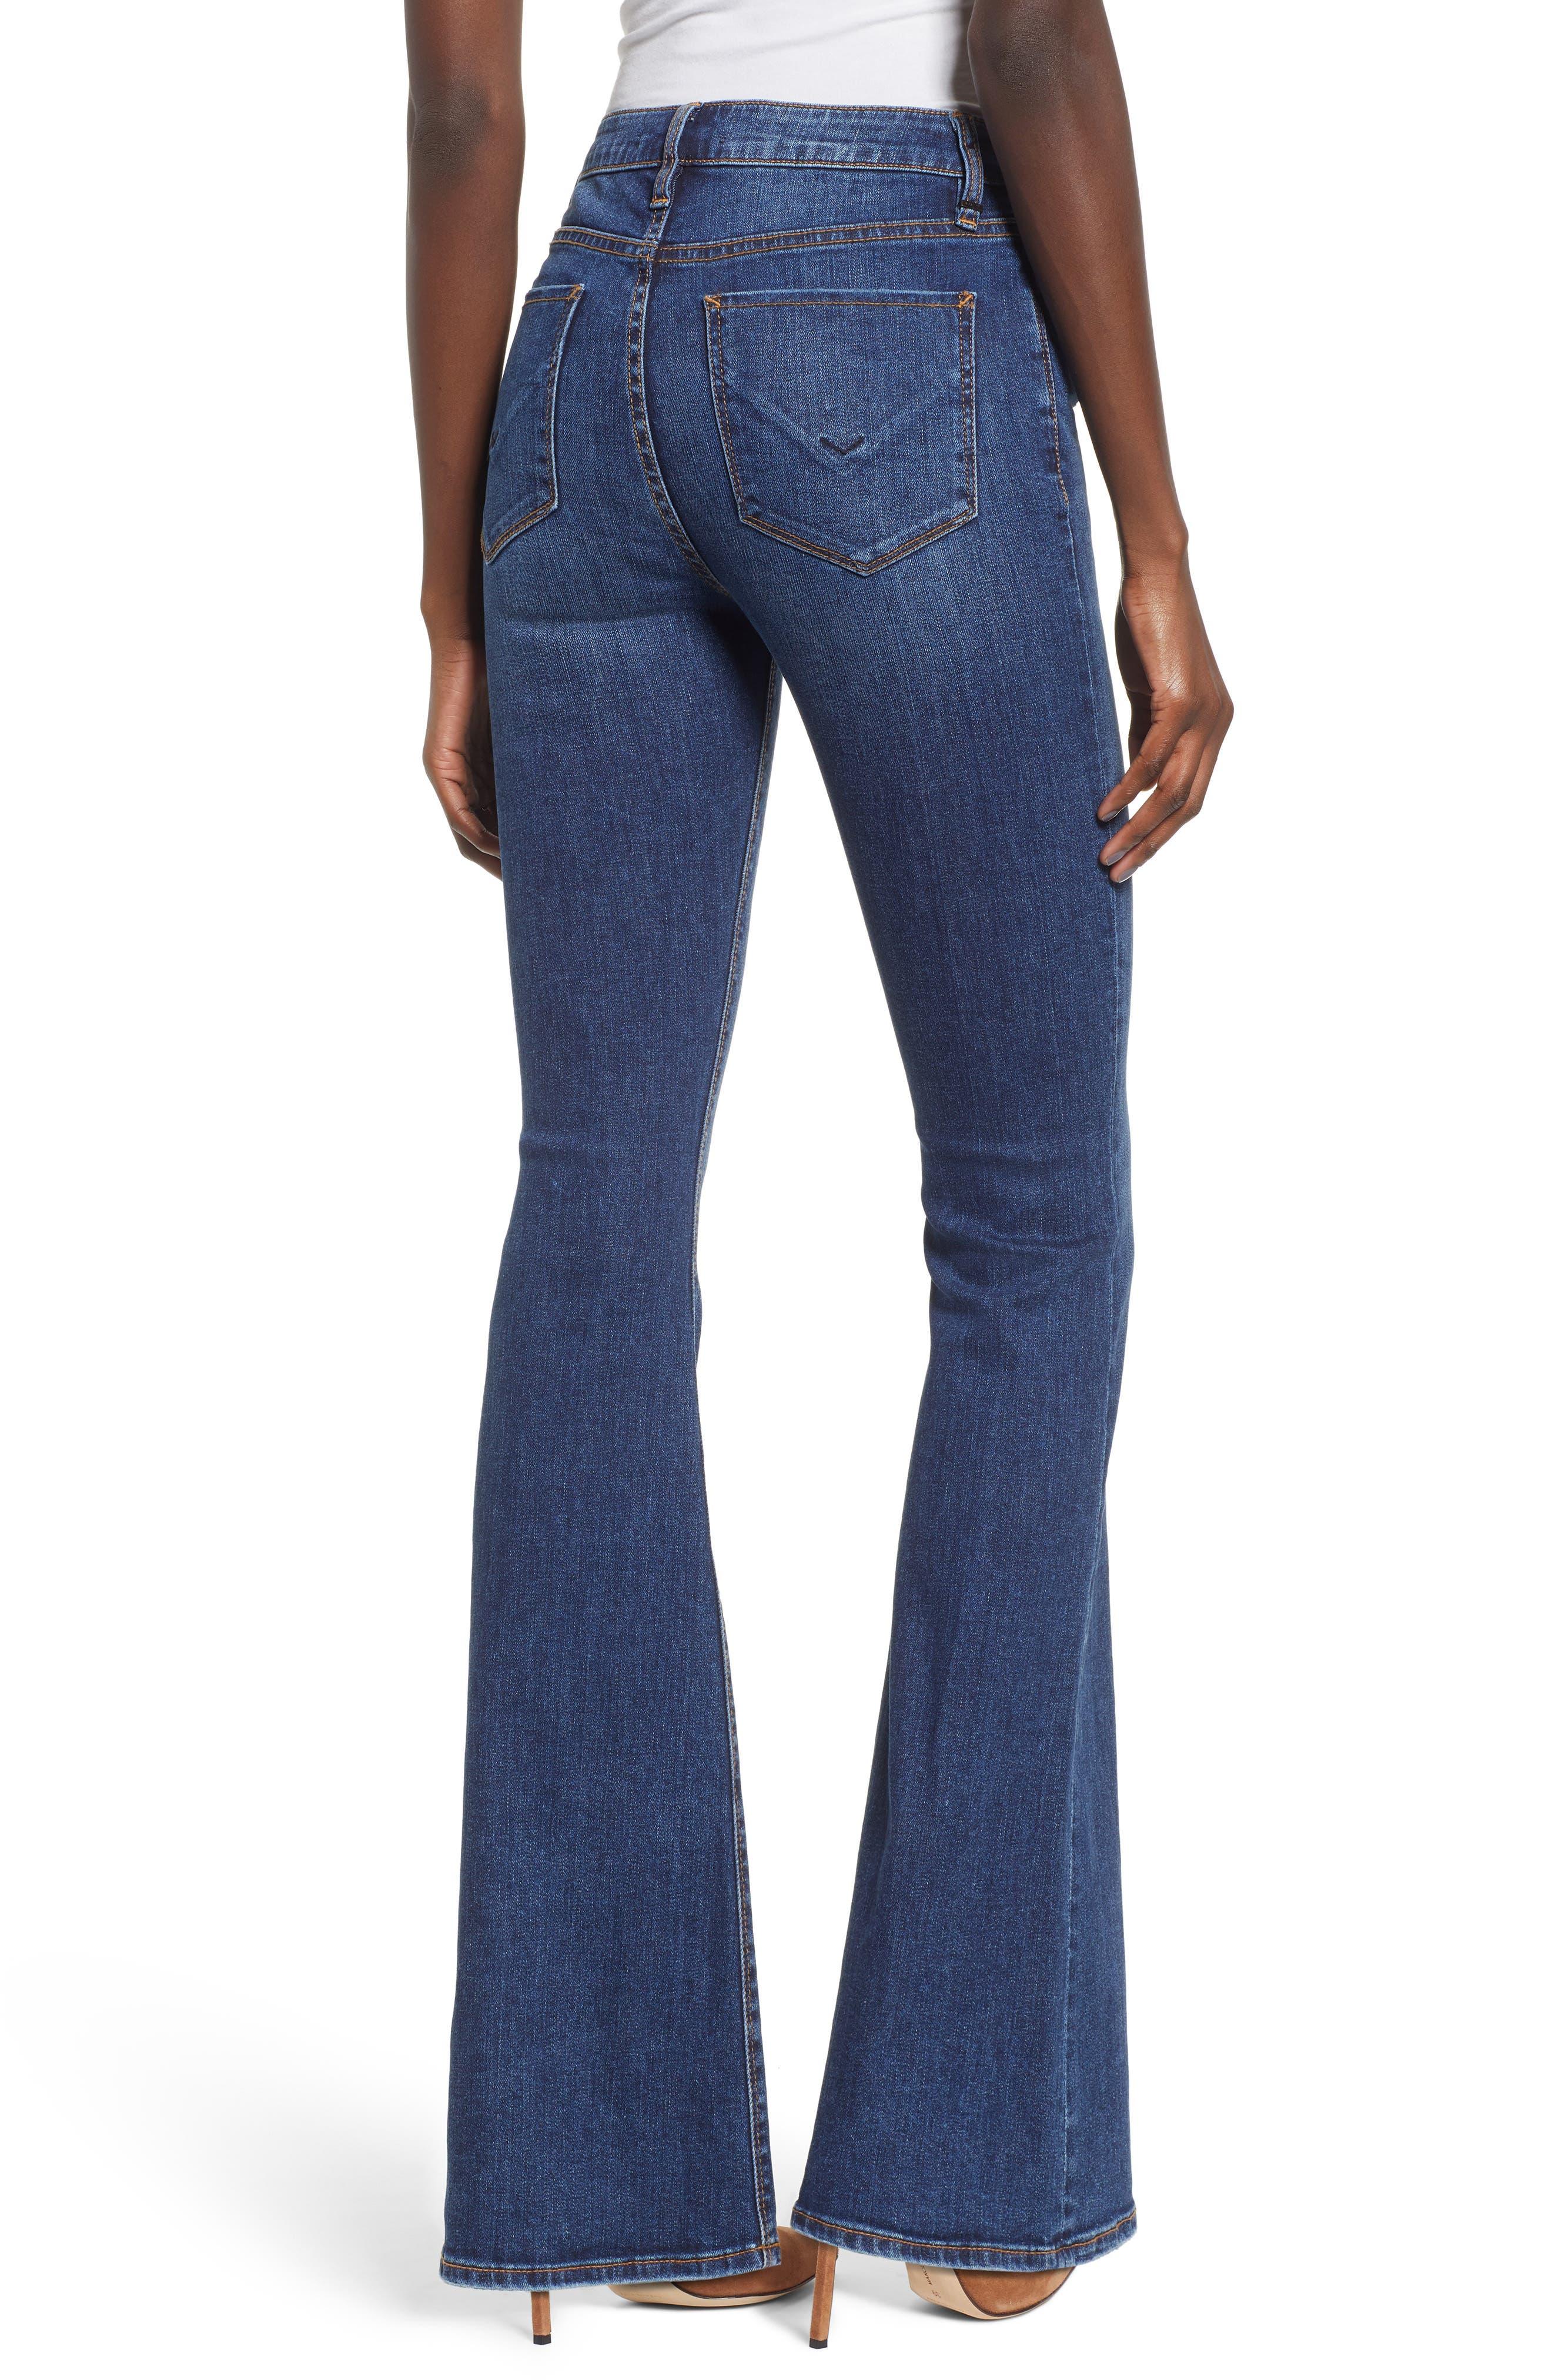 HUDSON JEANS, Holly High Waist Flare Jeans, Alternate thumbnail 2, color, VAGABOND